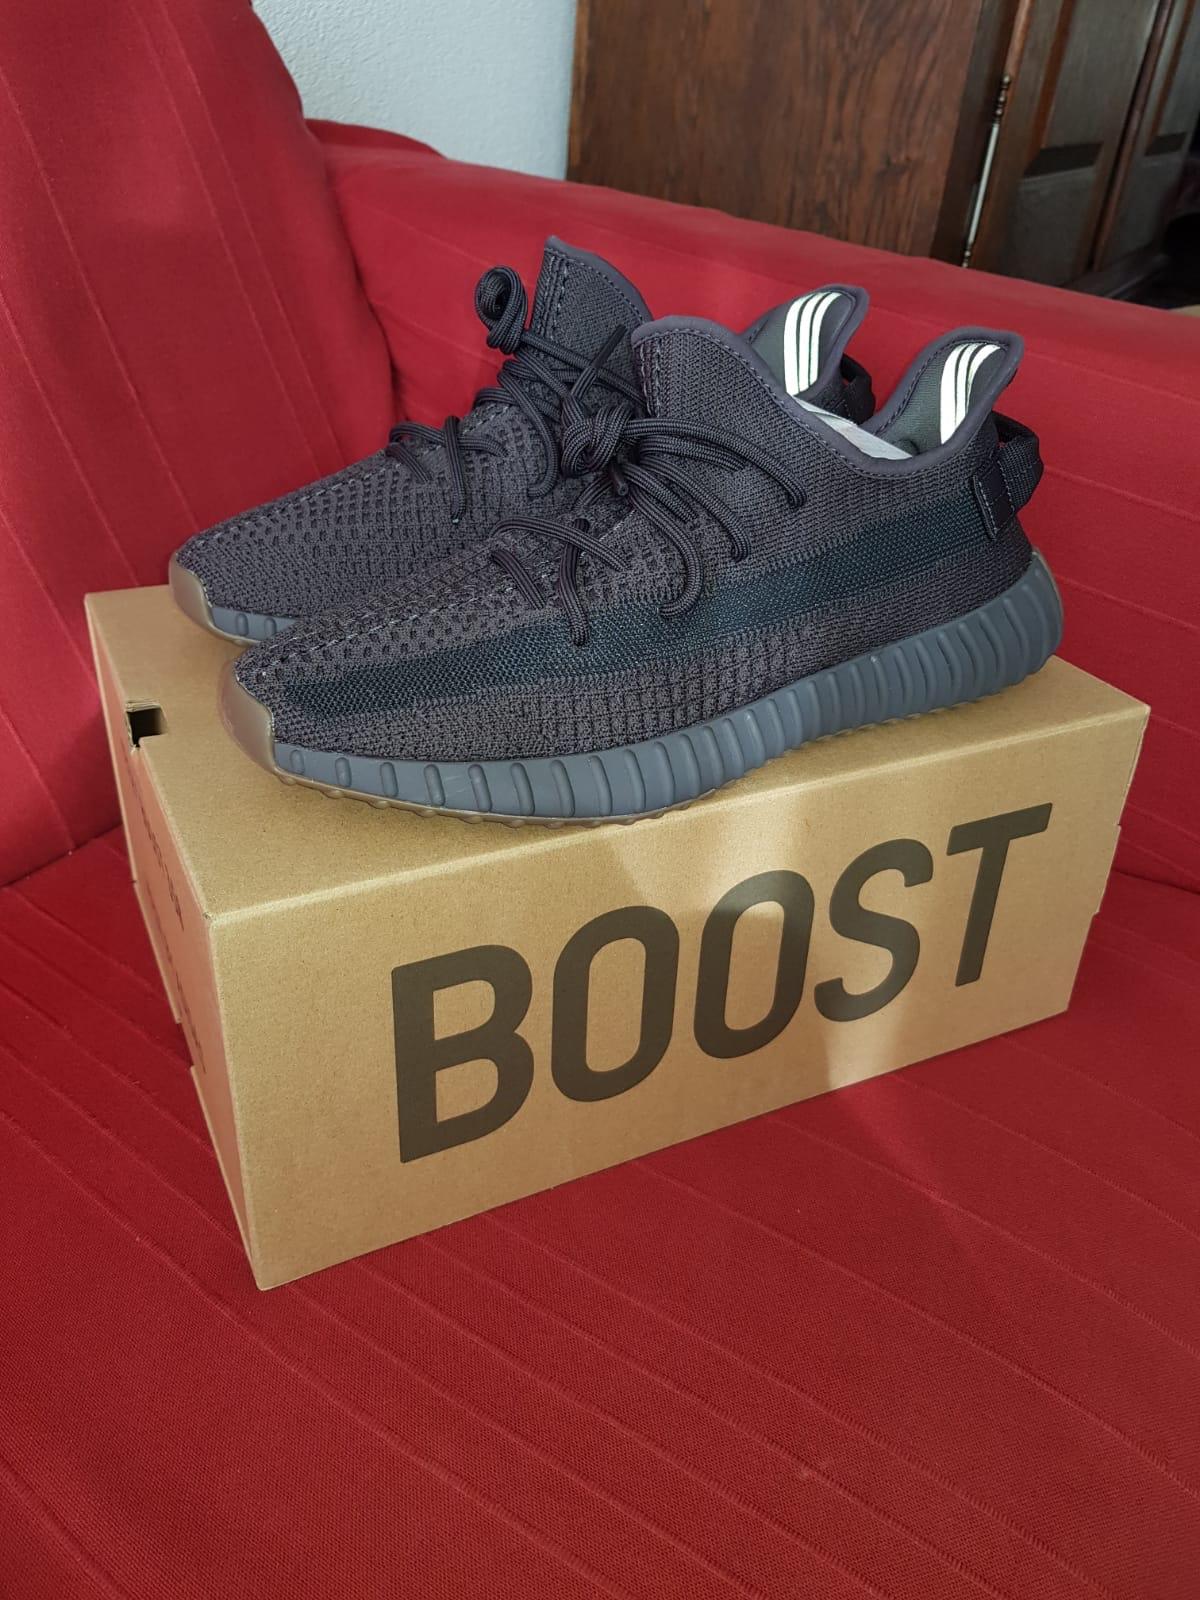 Adidas Yeezy - $260 - Size 44